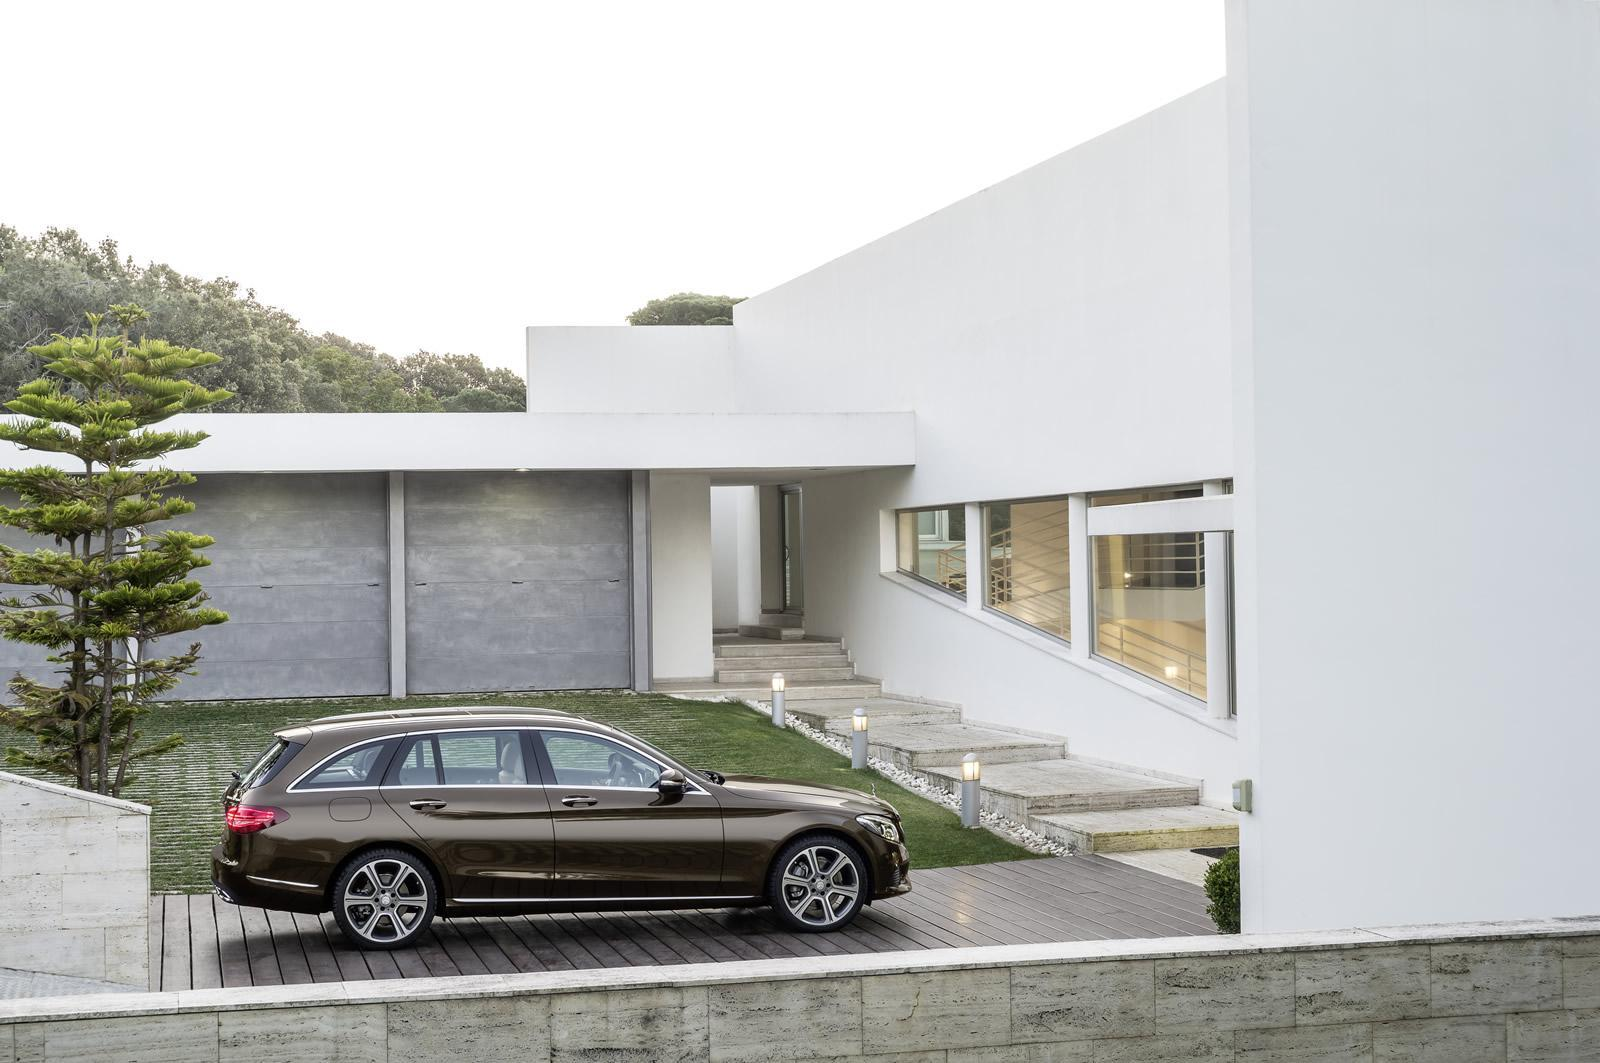 Foto de Mercedes-Benz Clase C Estate 2014 (15/36)